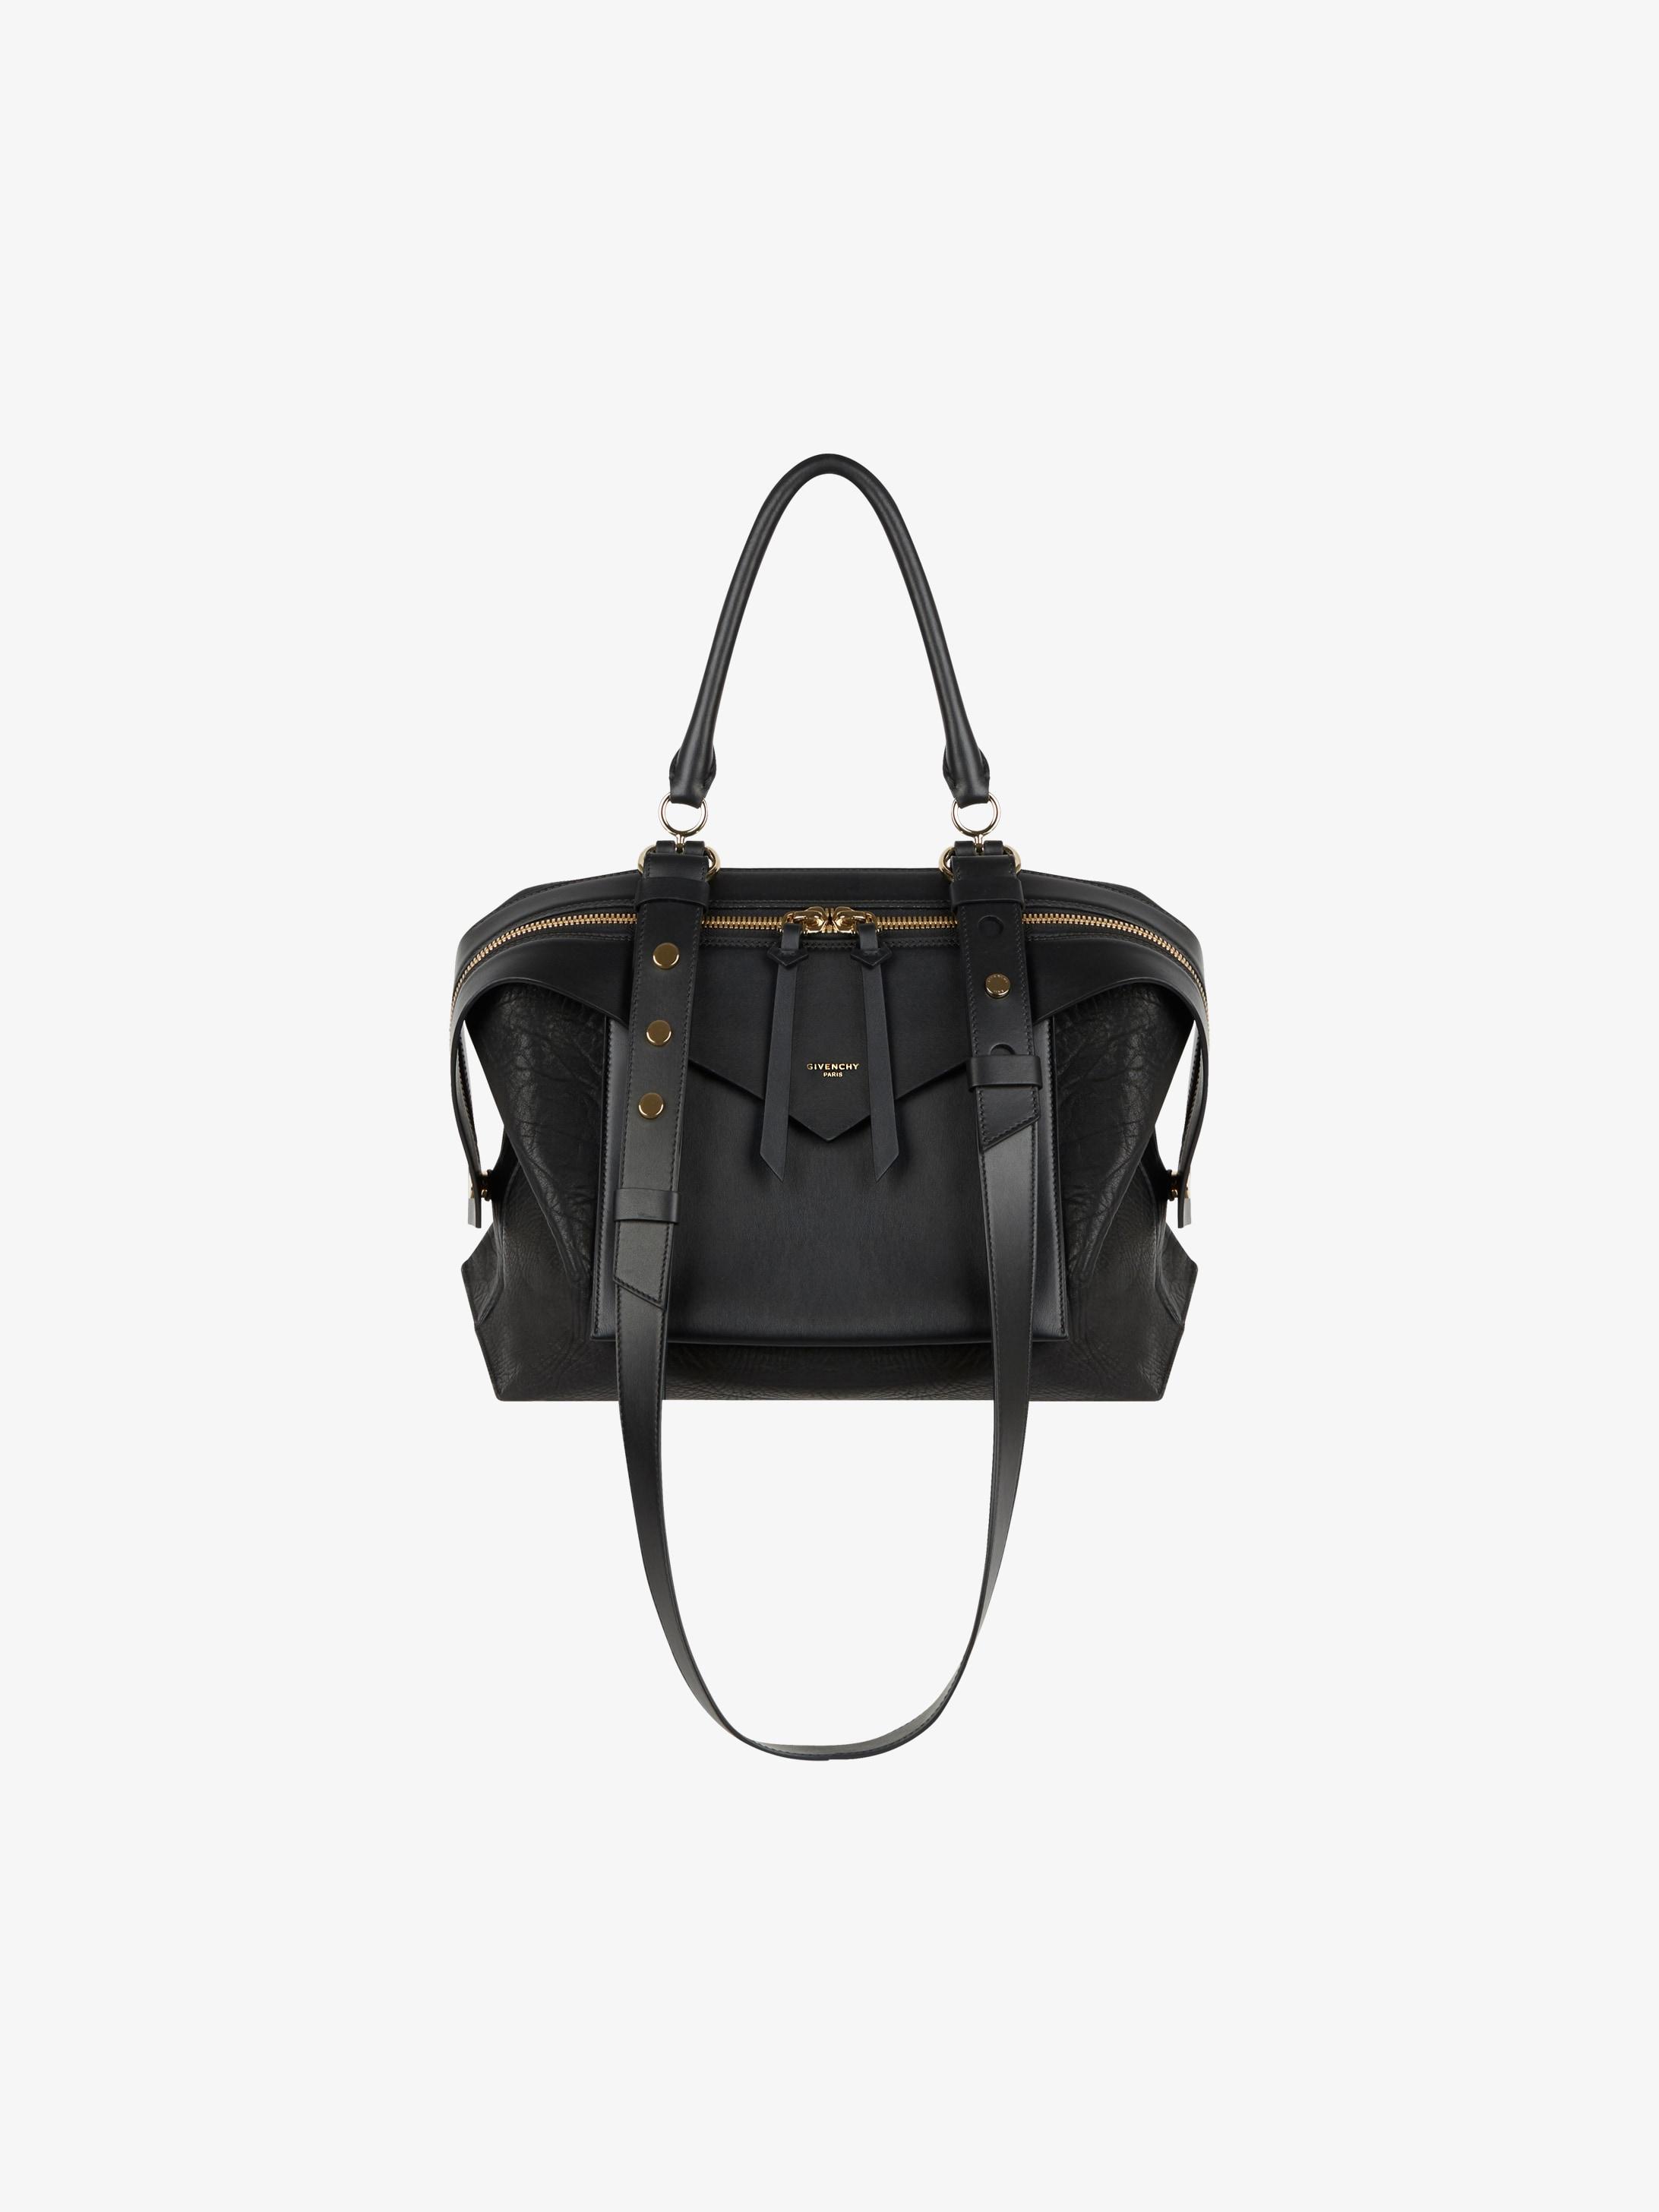 Medium Sway bag in leather